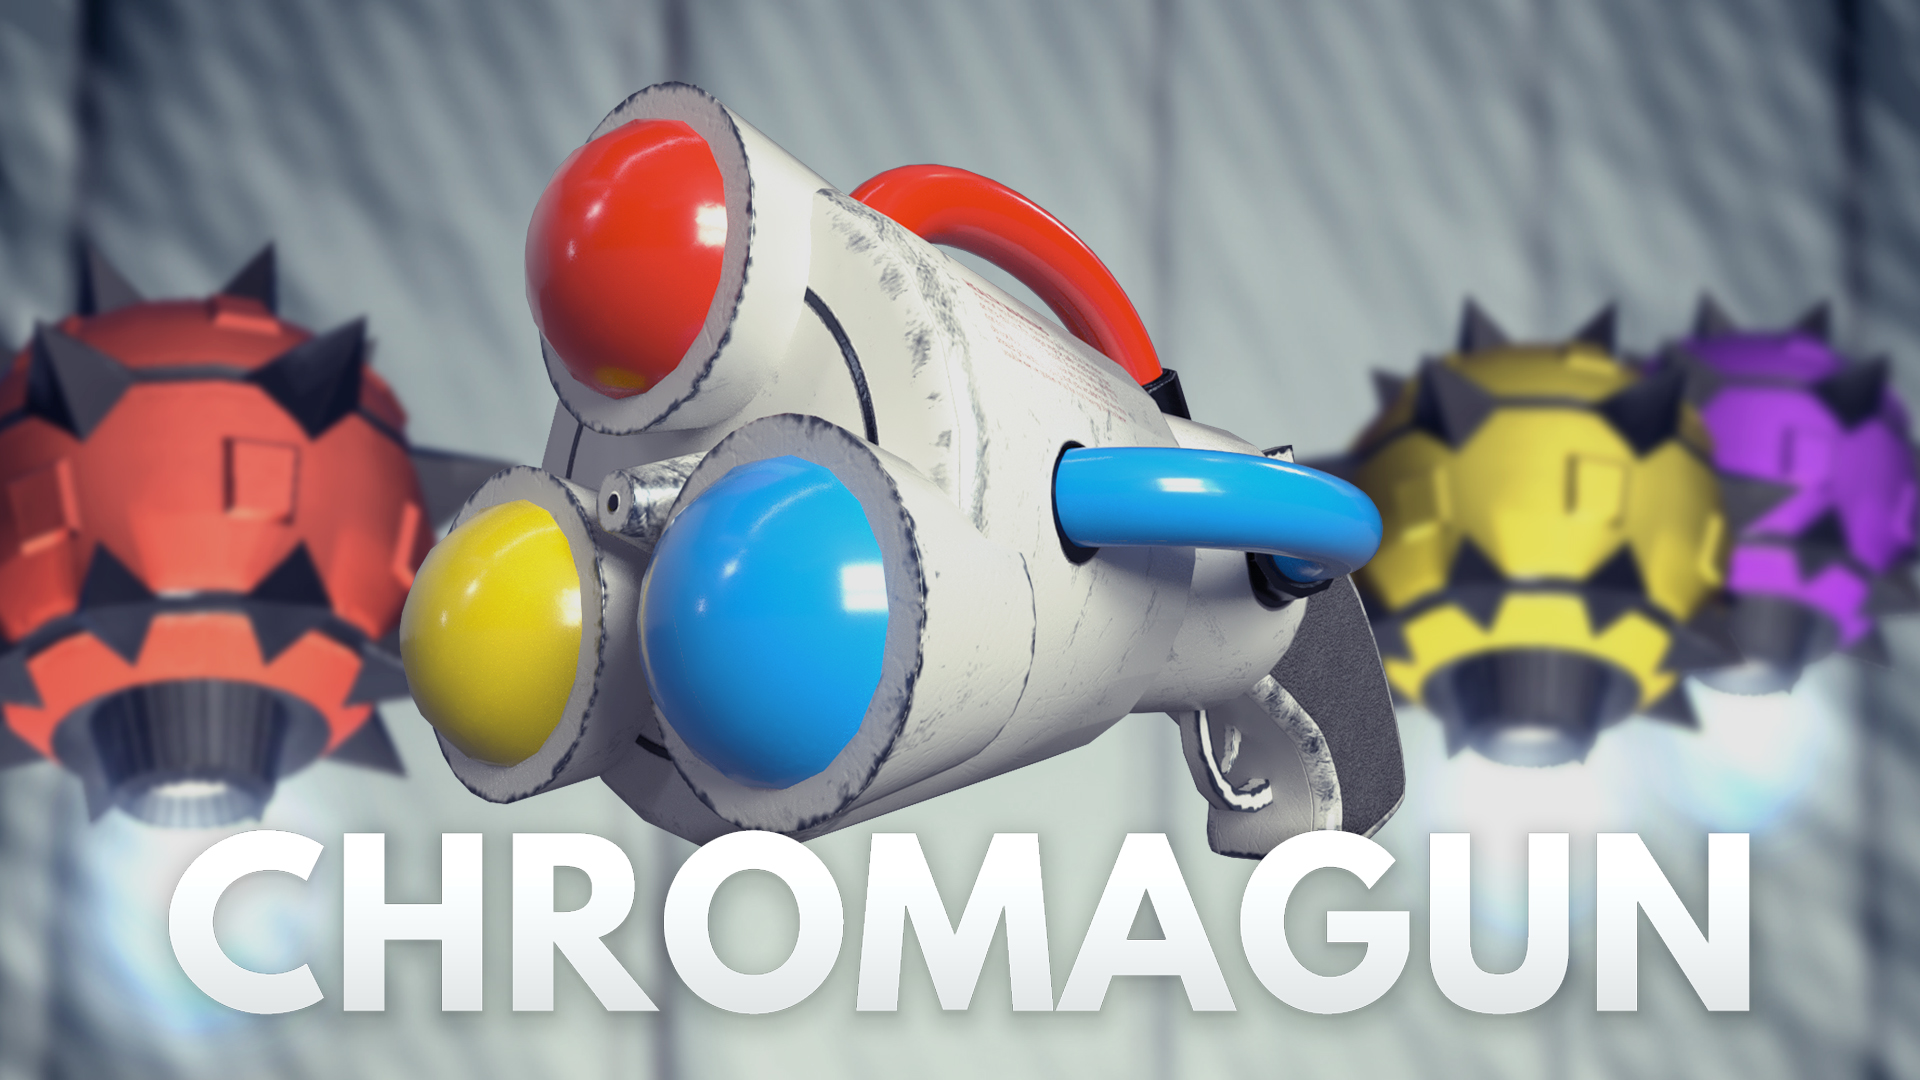 Chroma Gun